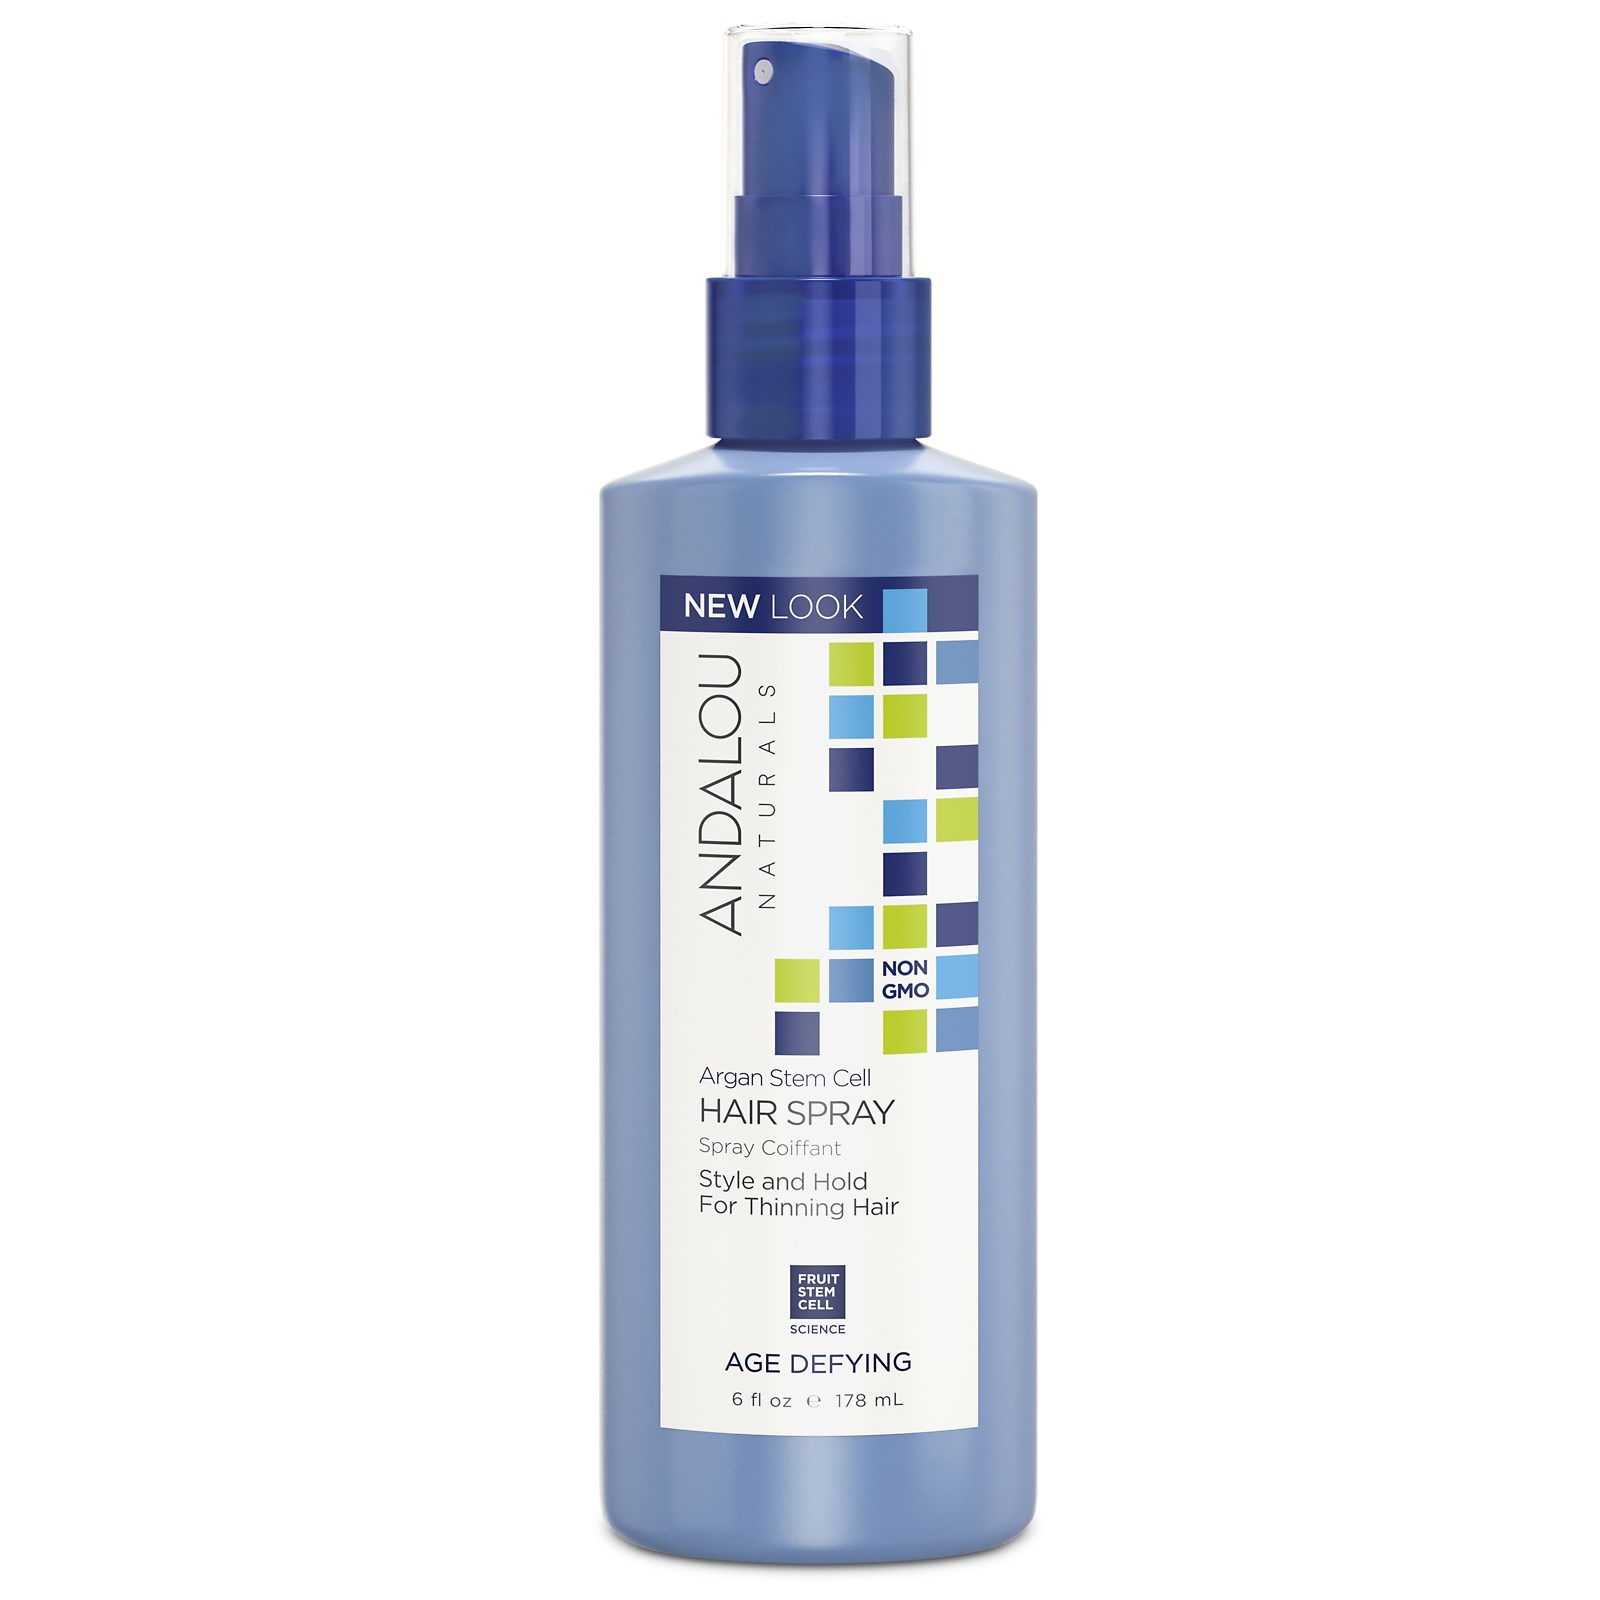 Andalou Naturals, Argan Stem Cells Hair Spray, Age Defying, 6 fl oz (178 ml)